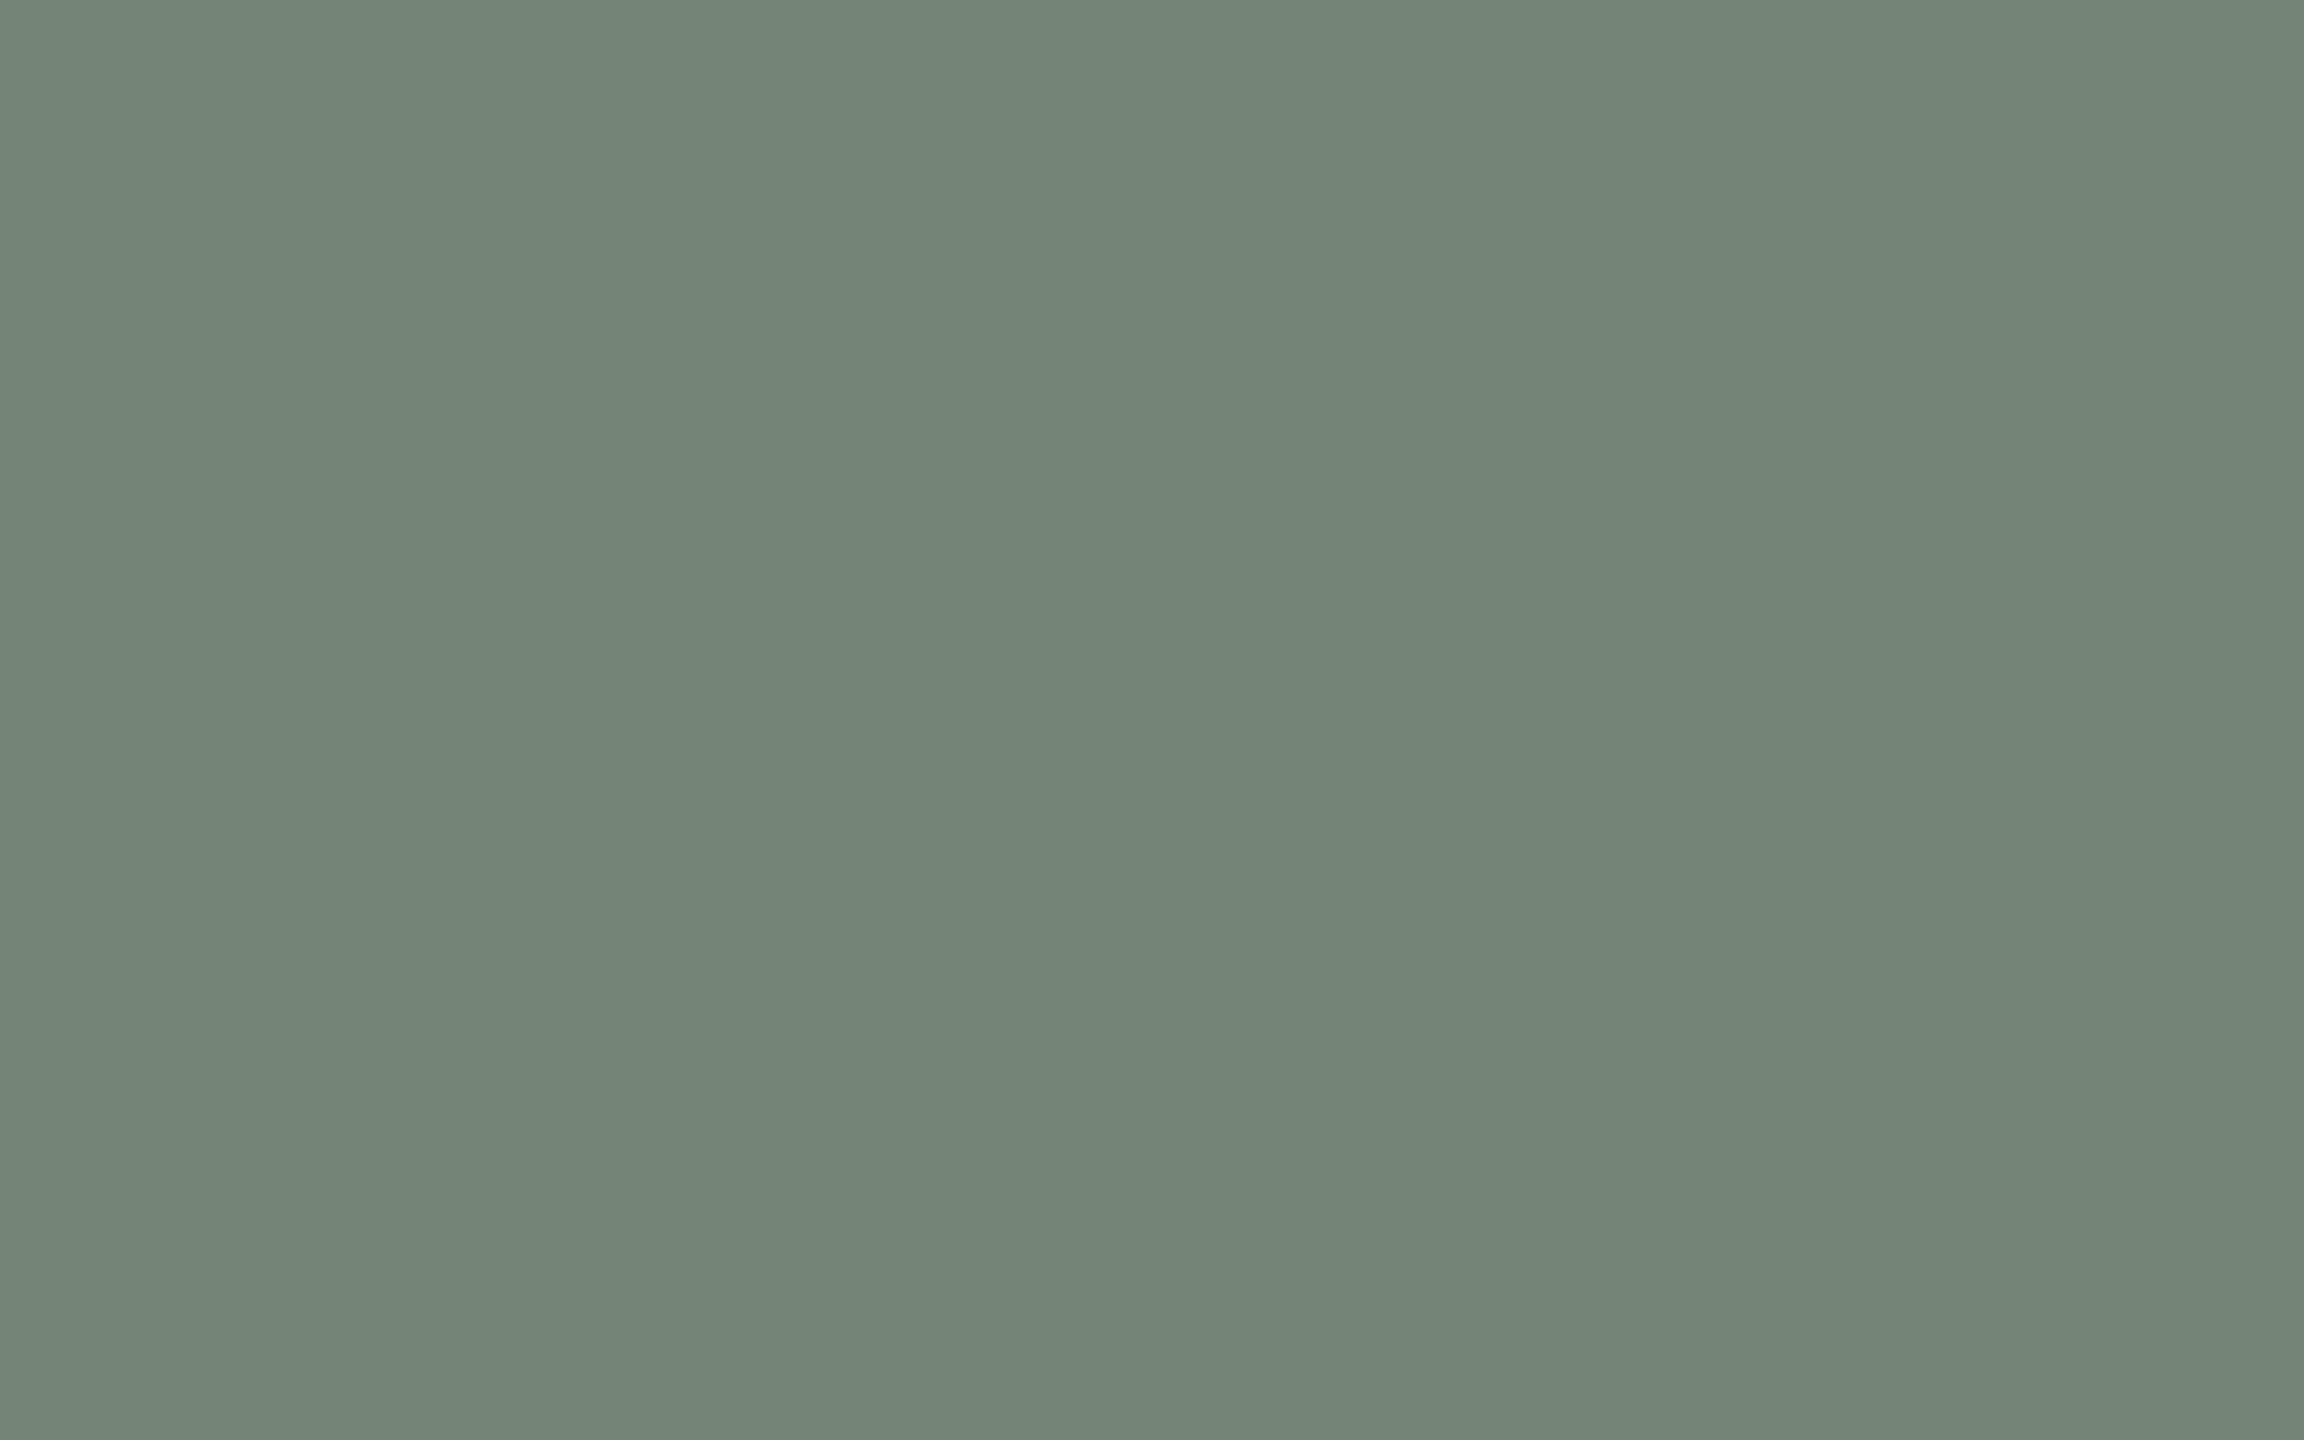 2304x1440 Xanadu Solid Color Background